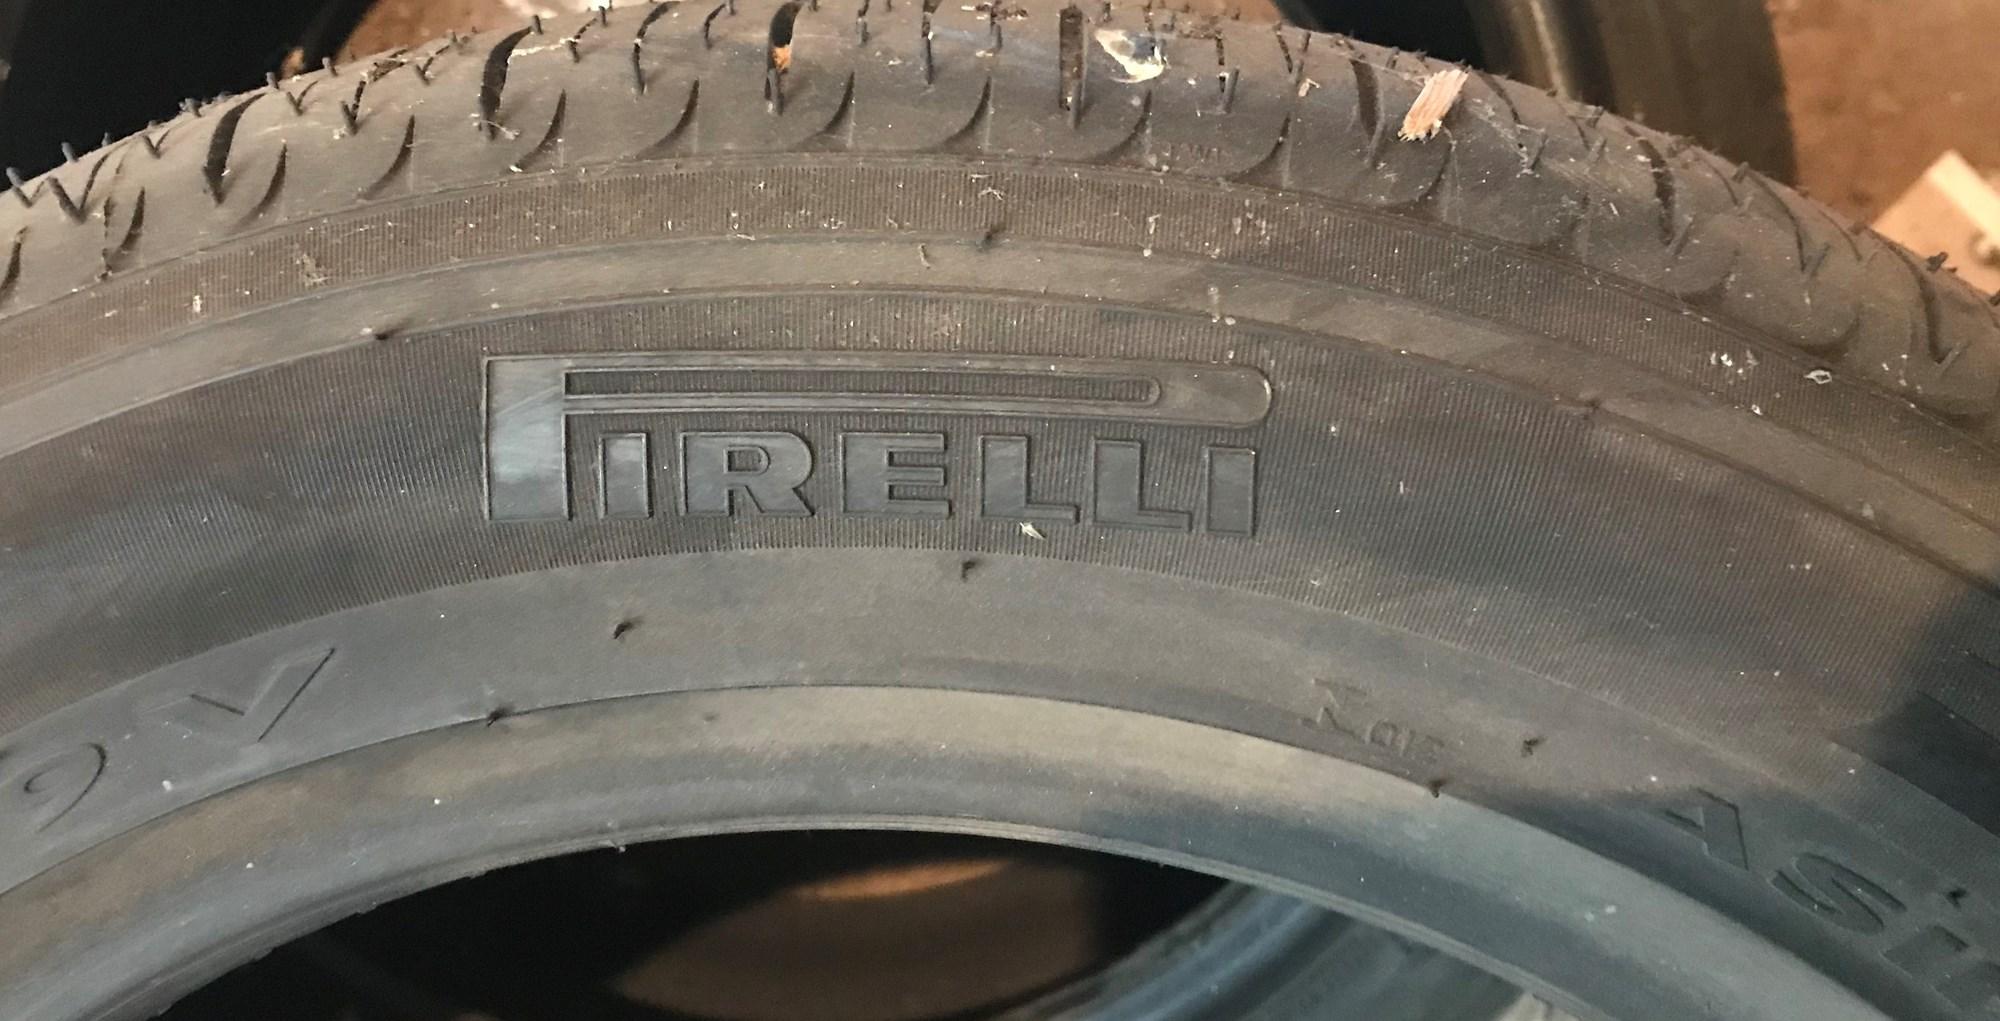 Pirrelli 235/55/17 Tyre